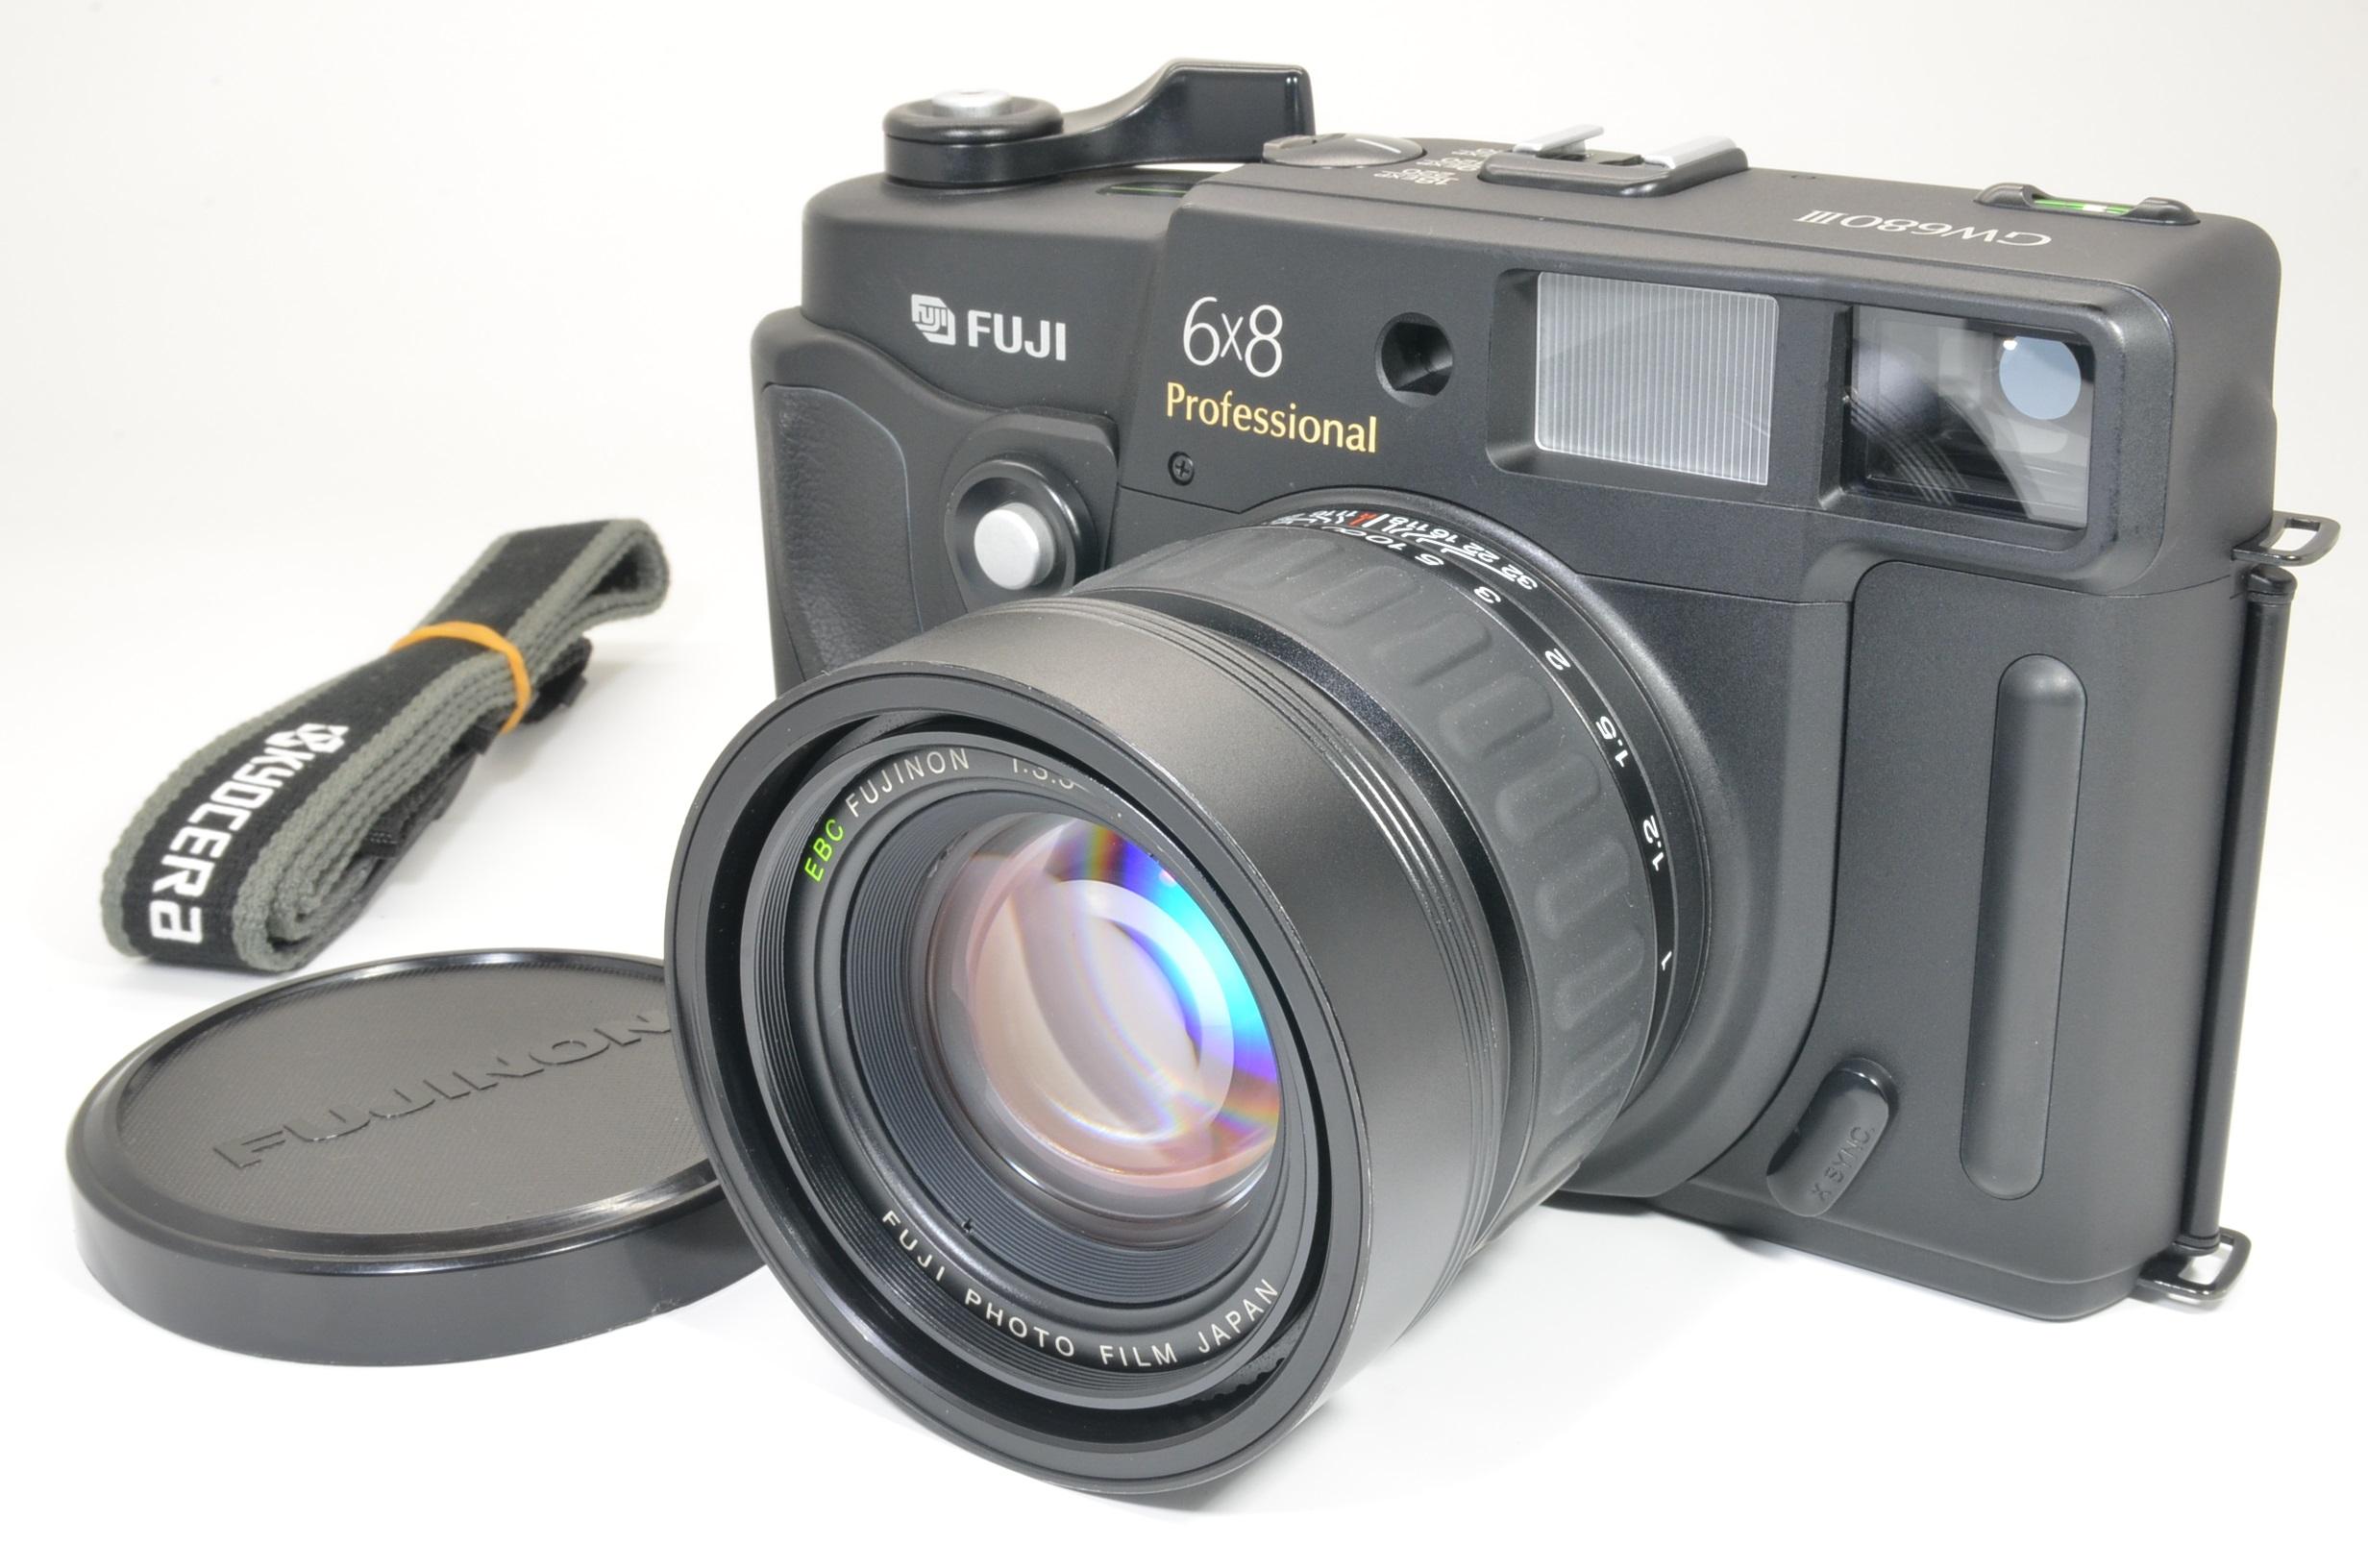 fuji fujifilm gw680iii 90mm f3.5 count 151 medium format camera shooting tested